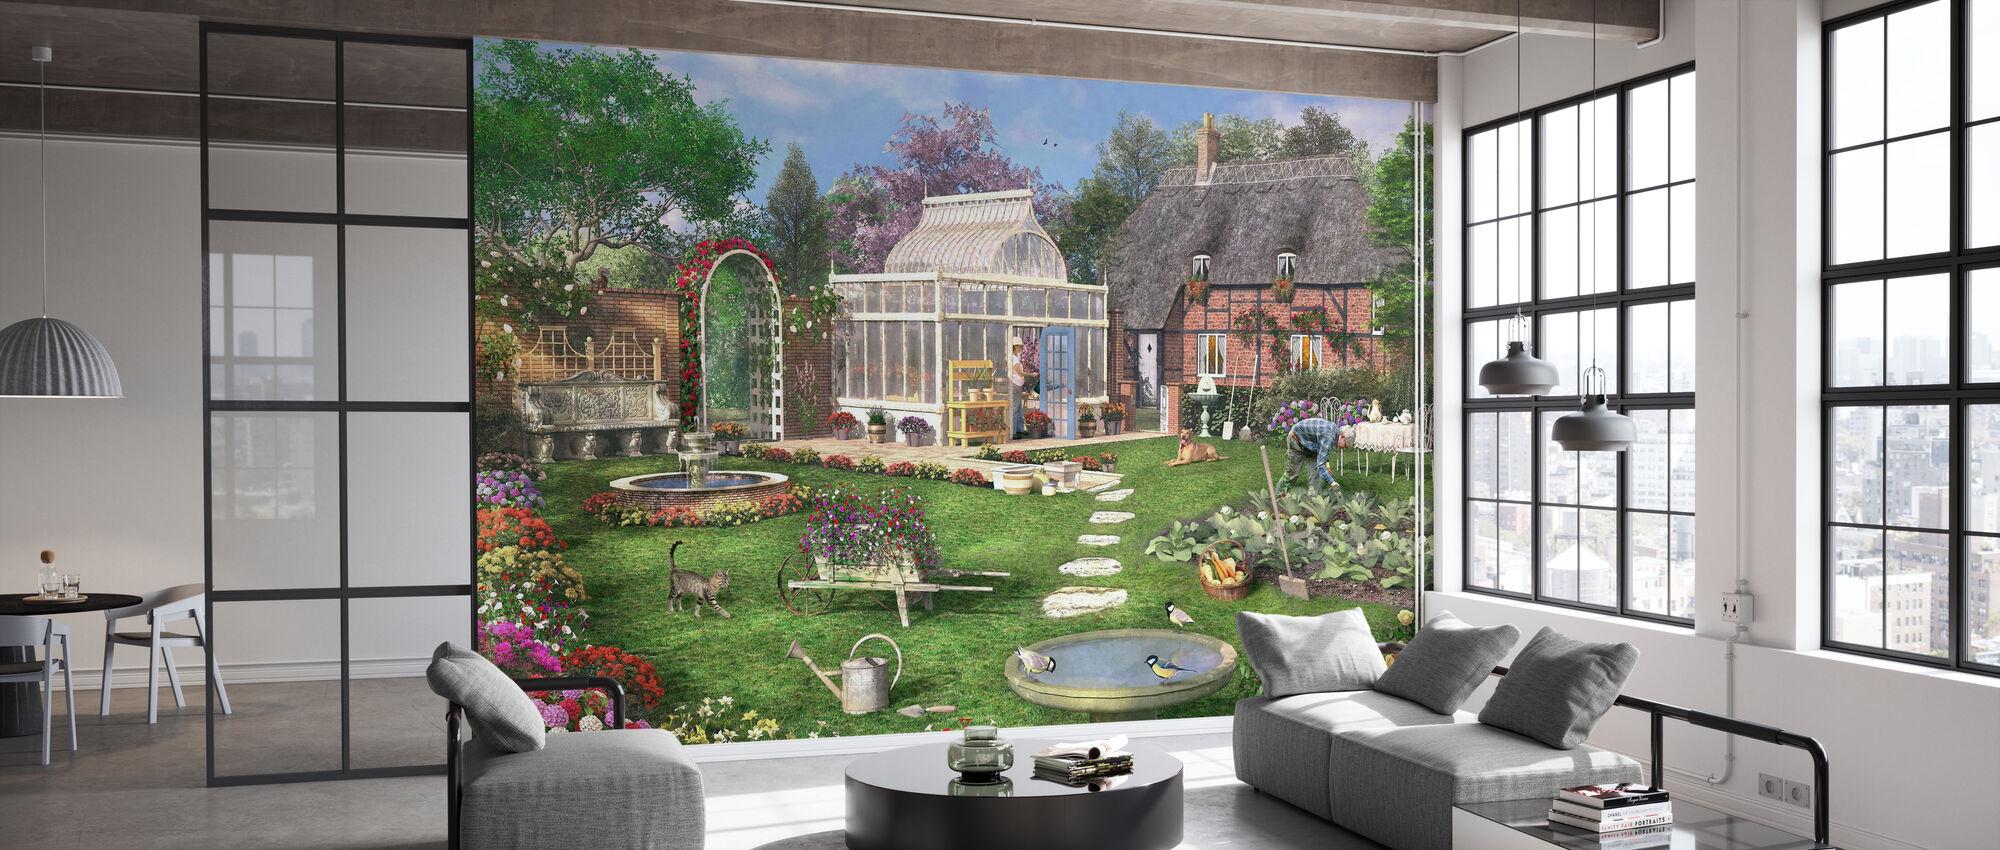 The Cottage Garden - Wallpaper - Office